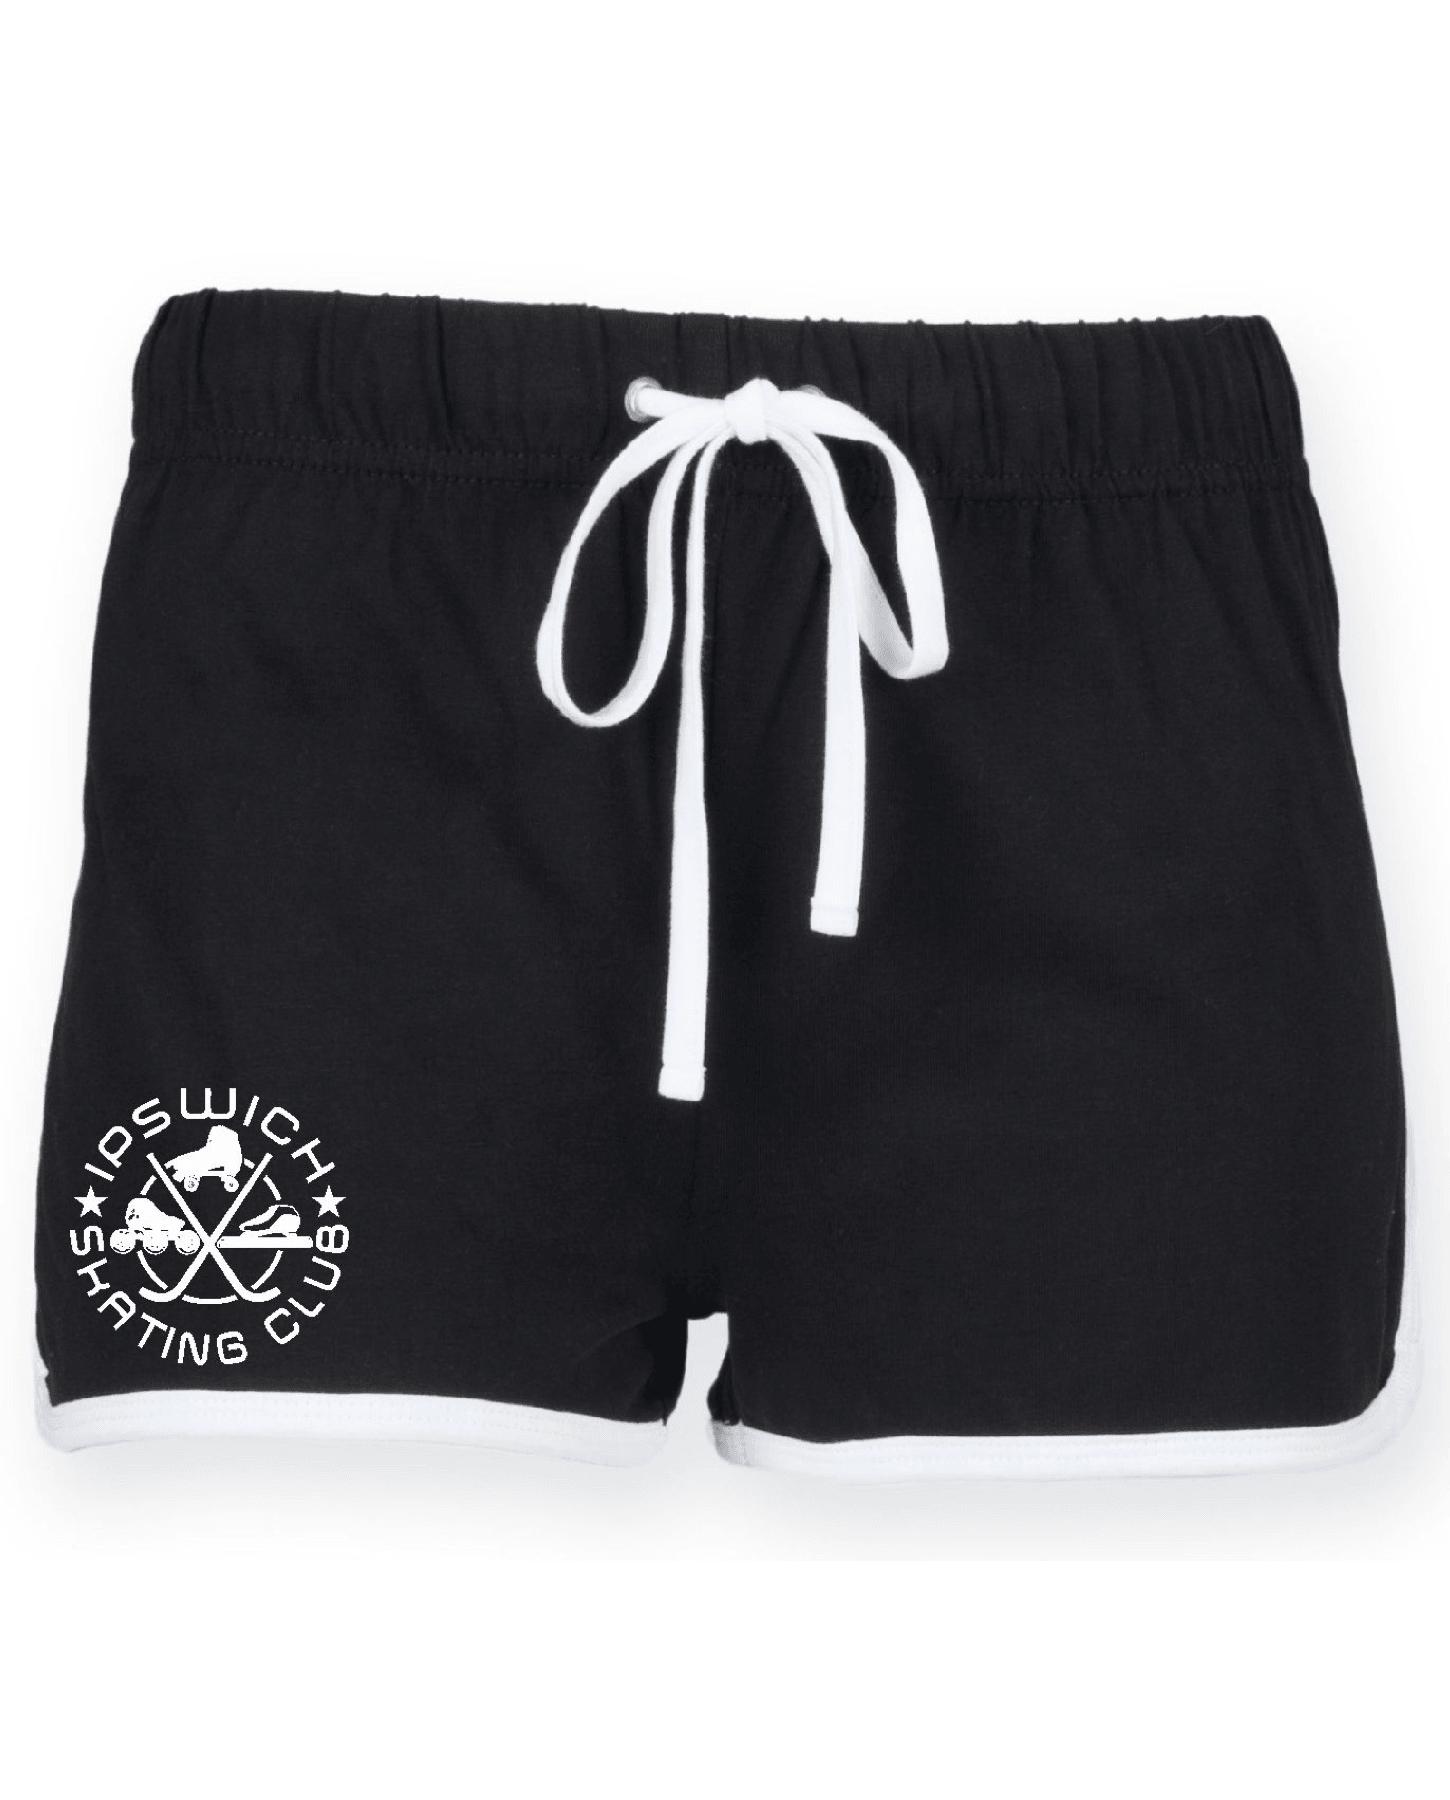 ISC – Retro Shorts (Kids)